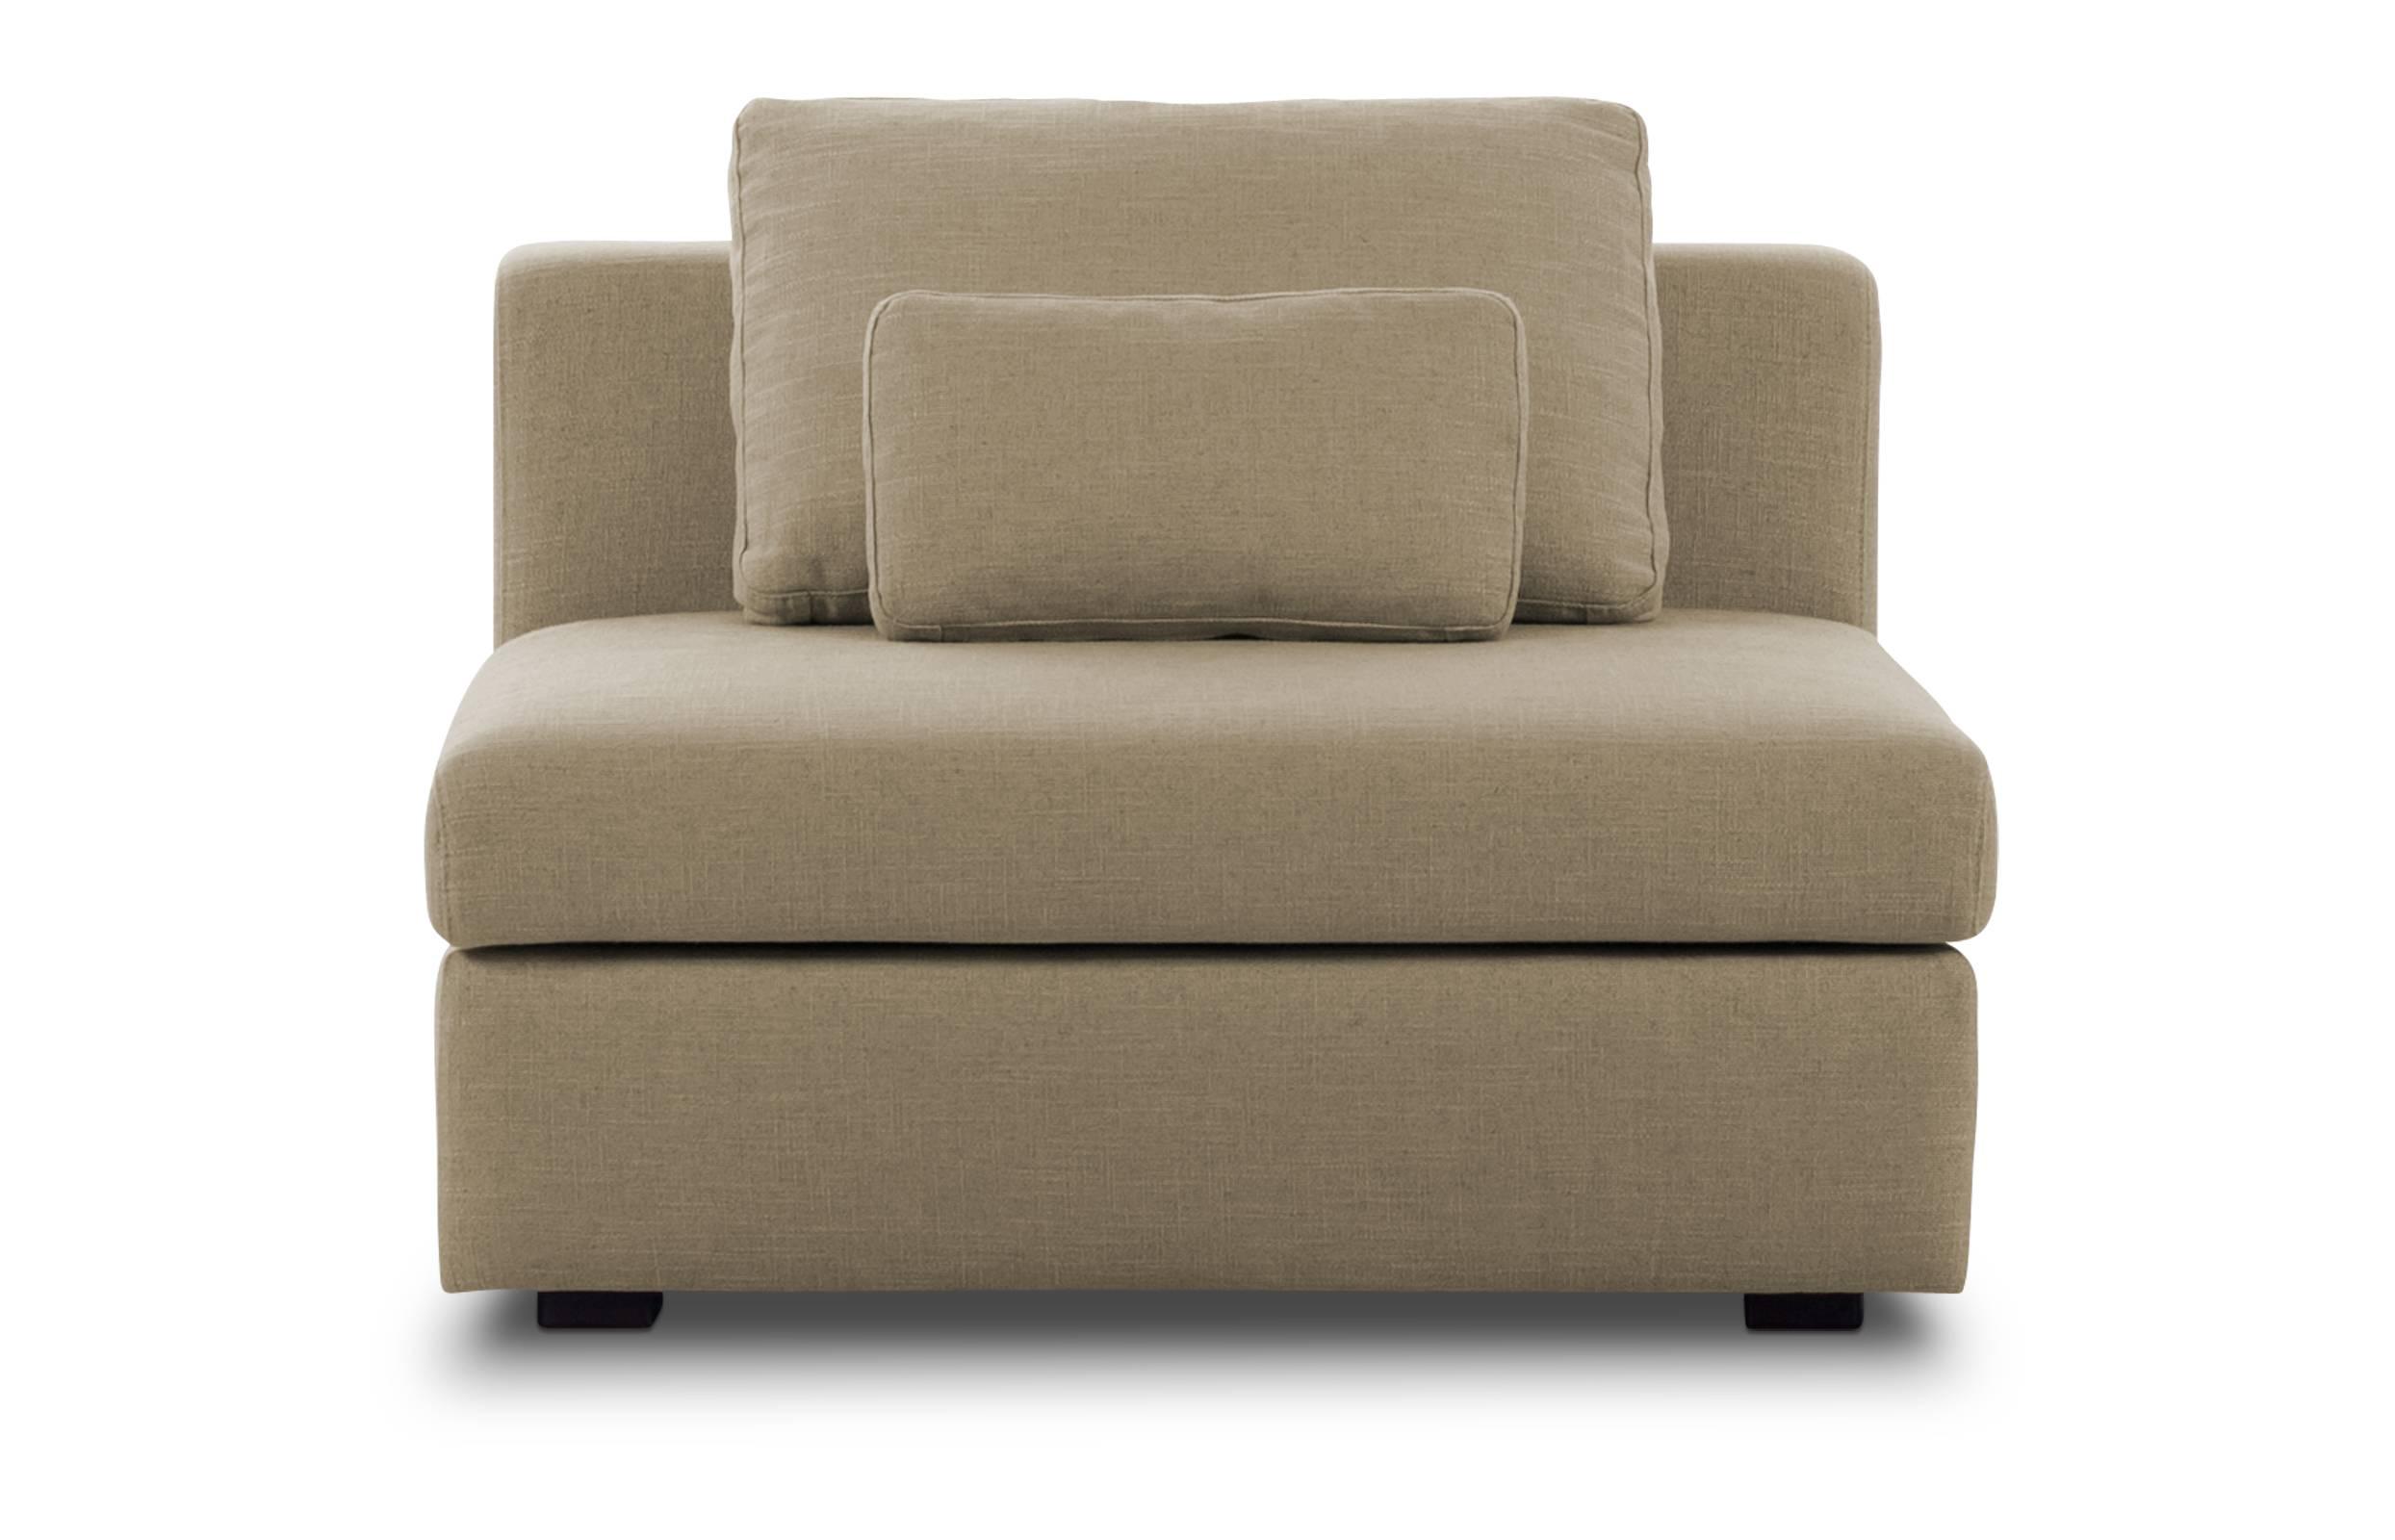 Full Size of Natura Sofa Couch Kansas Livingston Kaufen Brooklyn Love Newport Denver Home Gebraucht Pasadena Modulsofa Brick Sitzfeldtcom Mit Schlaffunktion Walter Knoll Sofa Natura Sofa